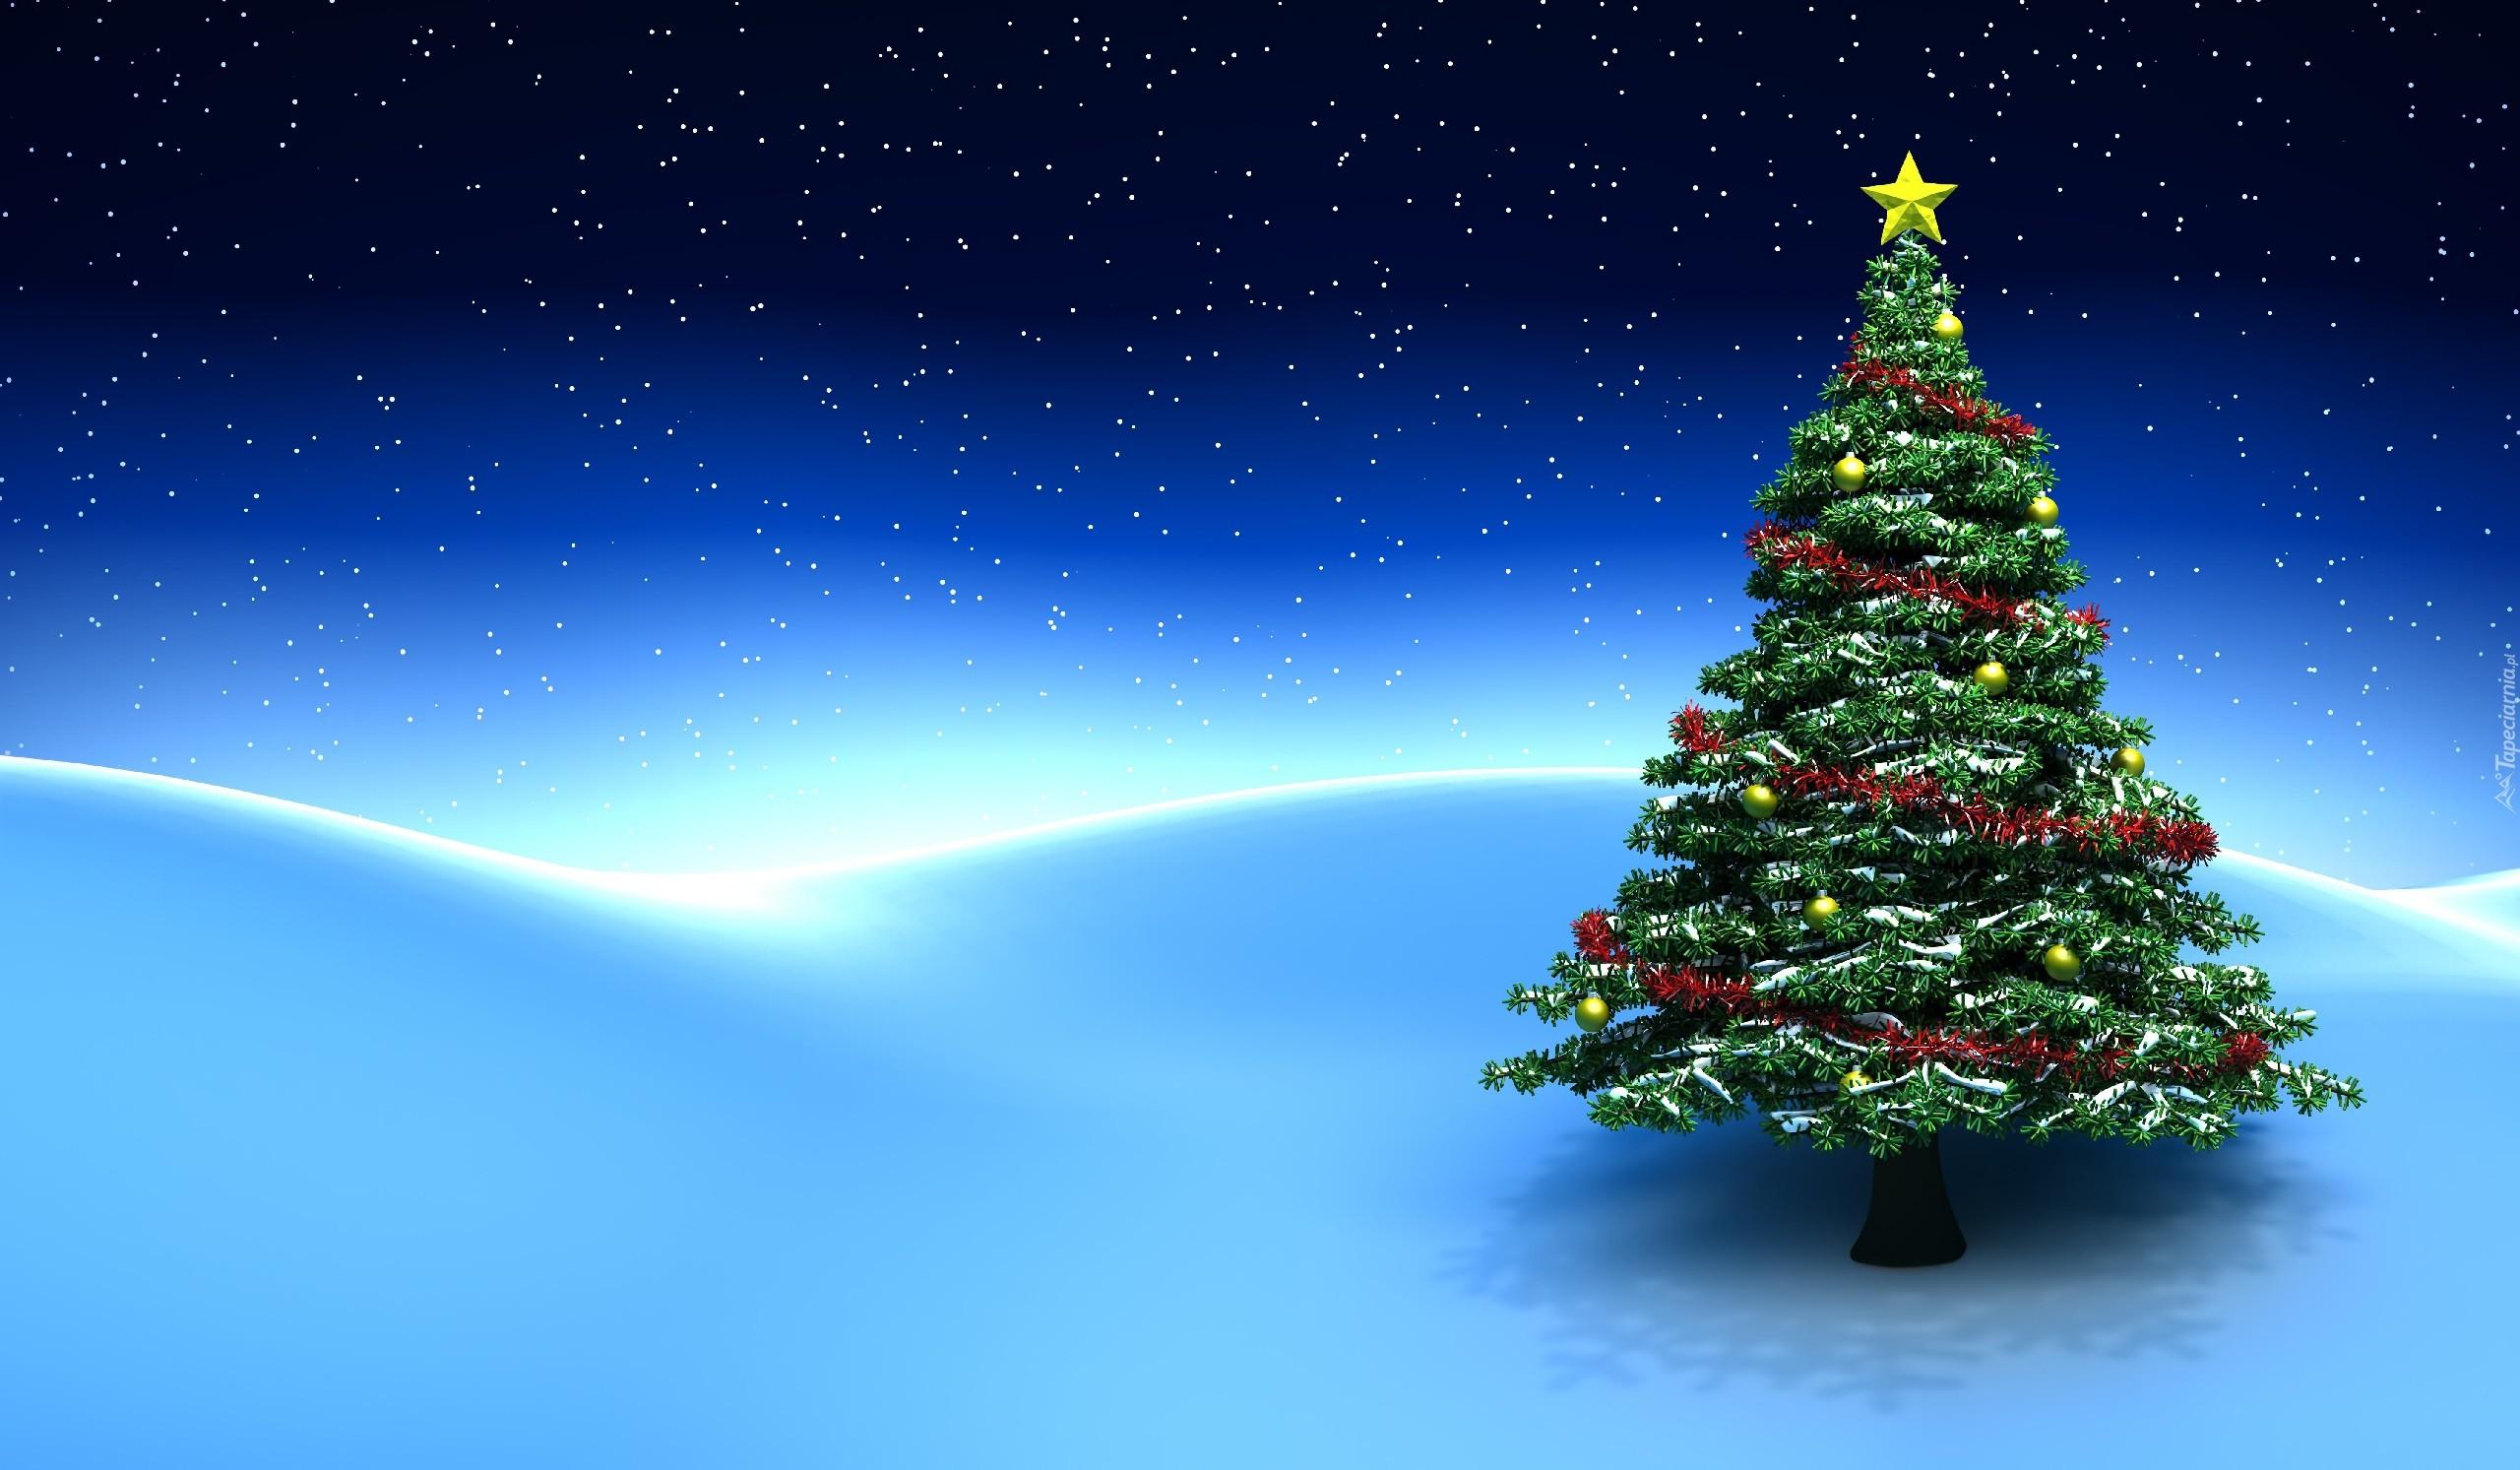 Fondos De Pantalla Bonitos De Navidad: Choinka, Śnieg, Boże, Narodzenie, Grafika